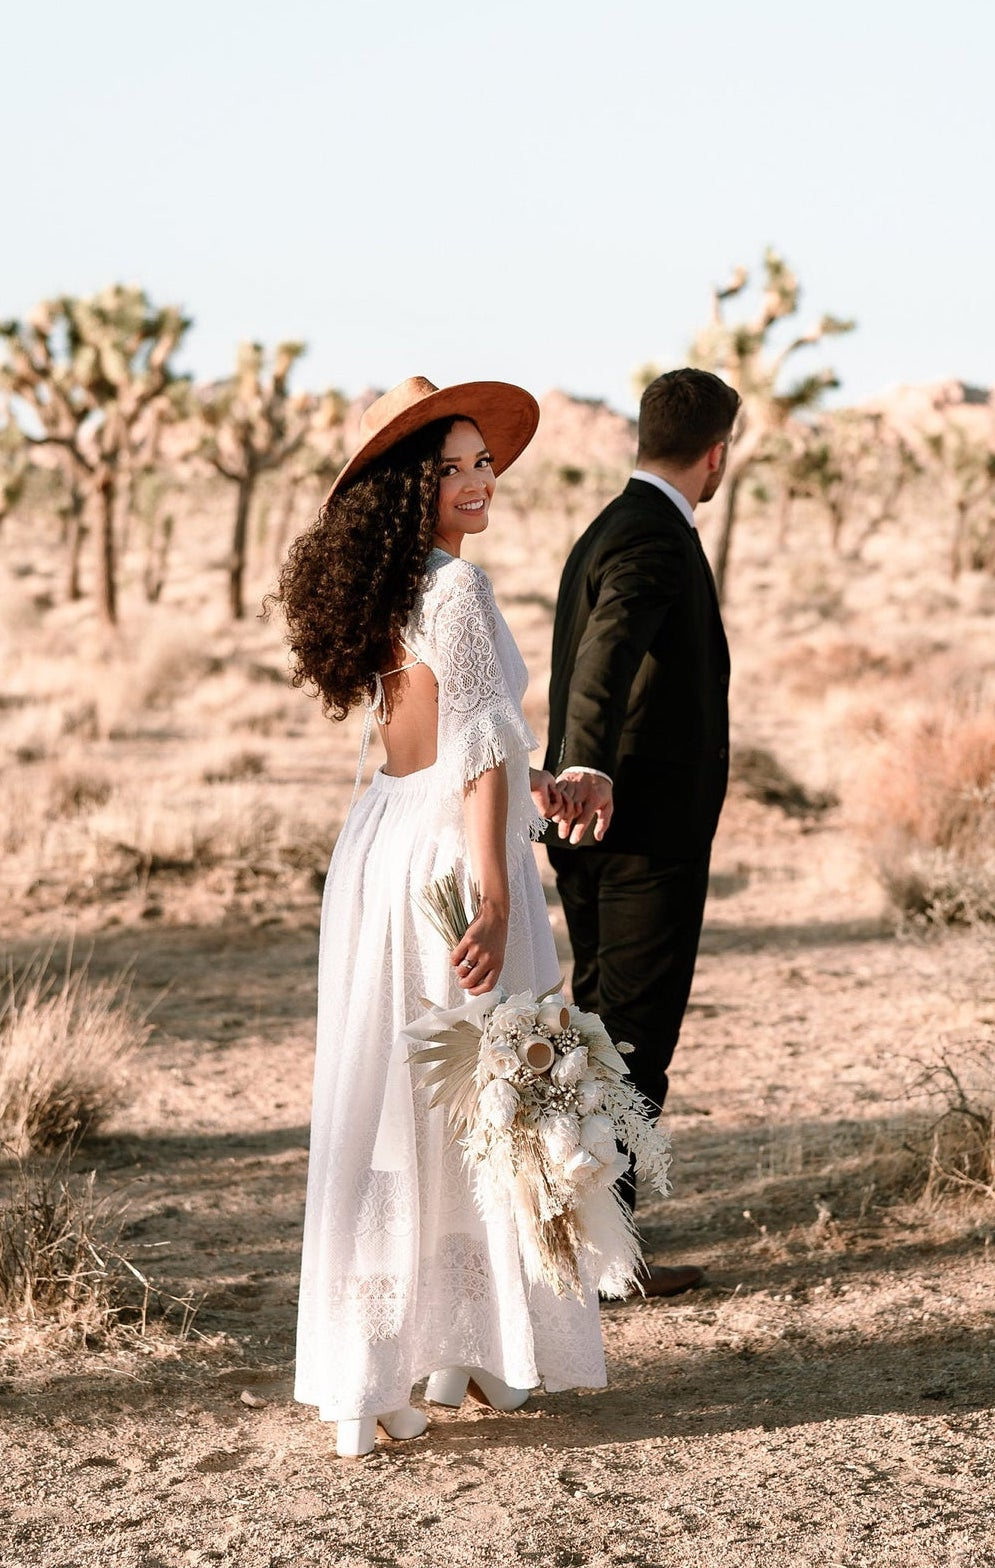 Affordable boho wedding dress under $300